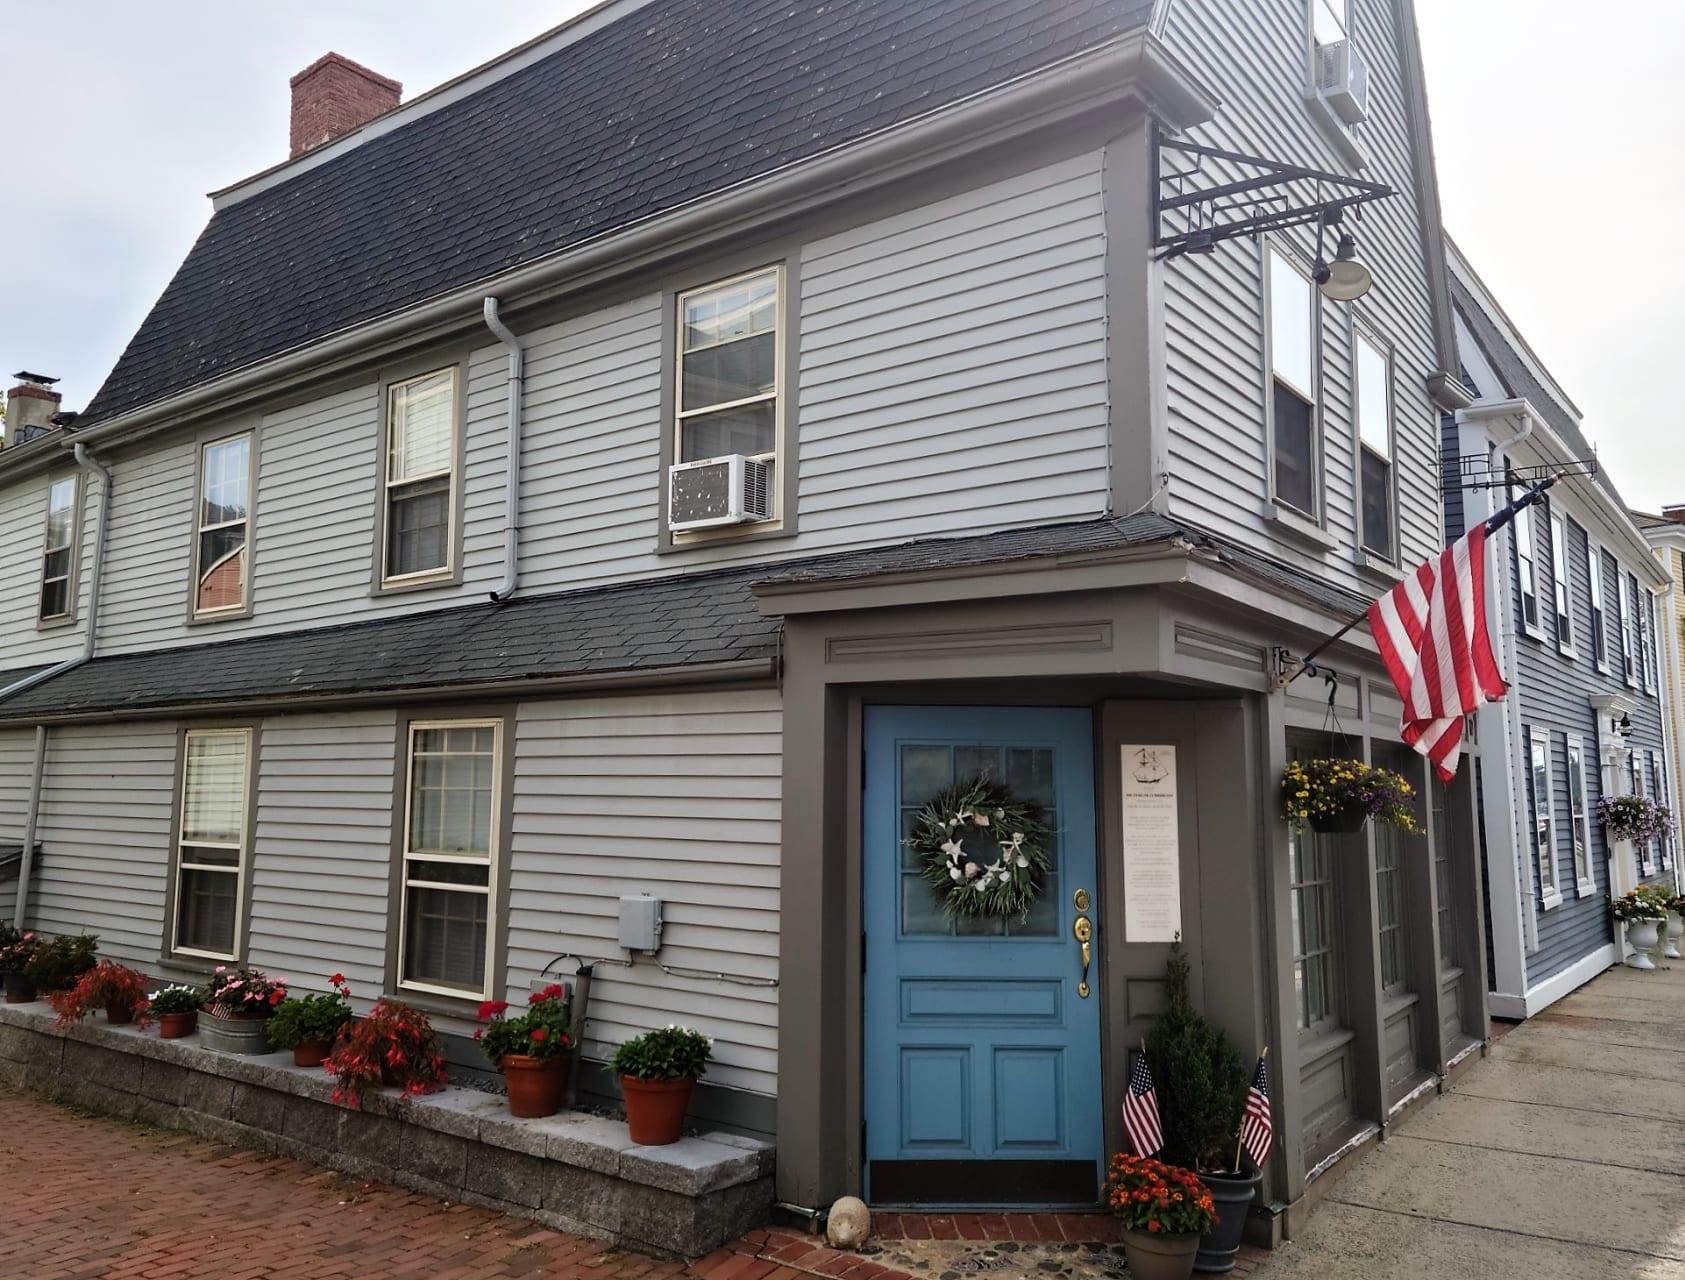 Salem Massachusetts - Old Town Marblehead